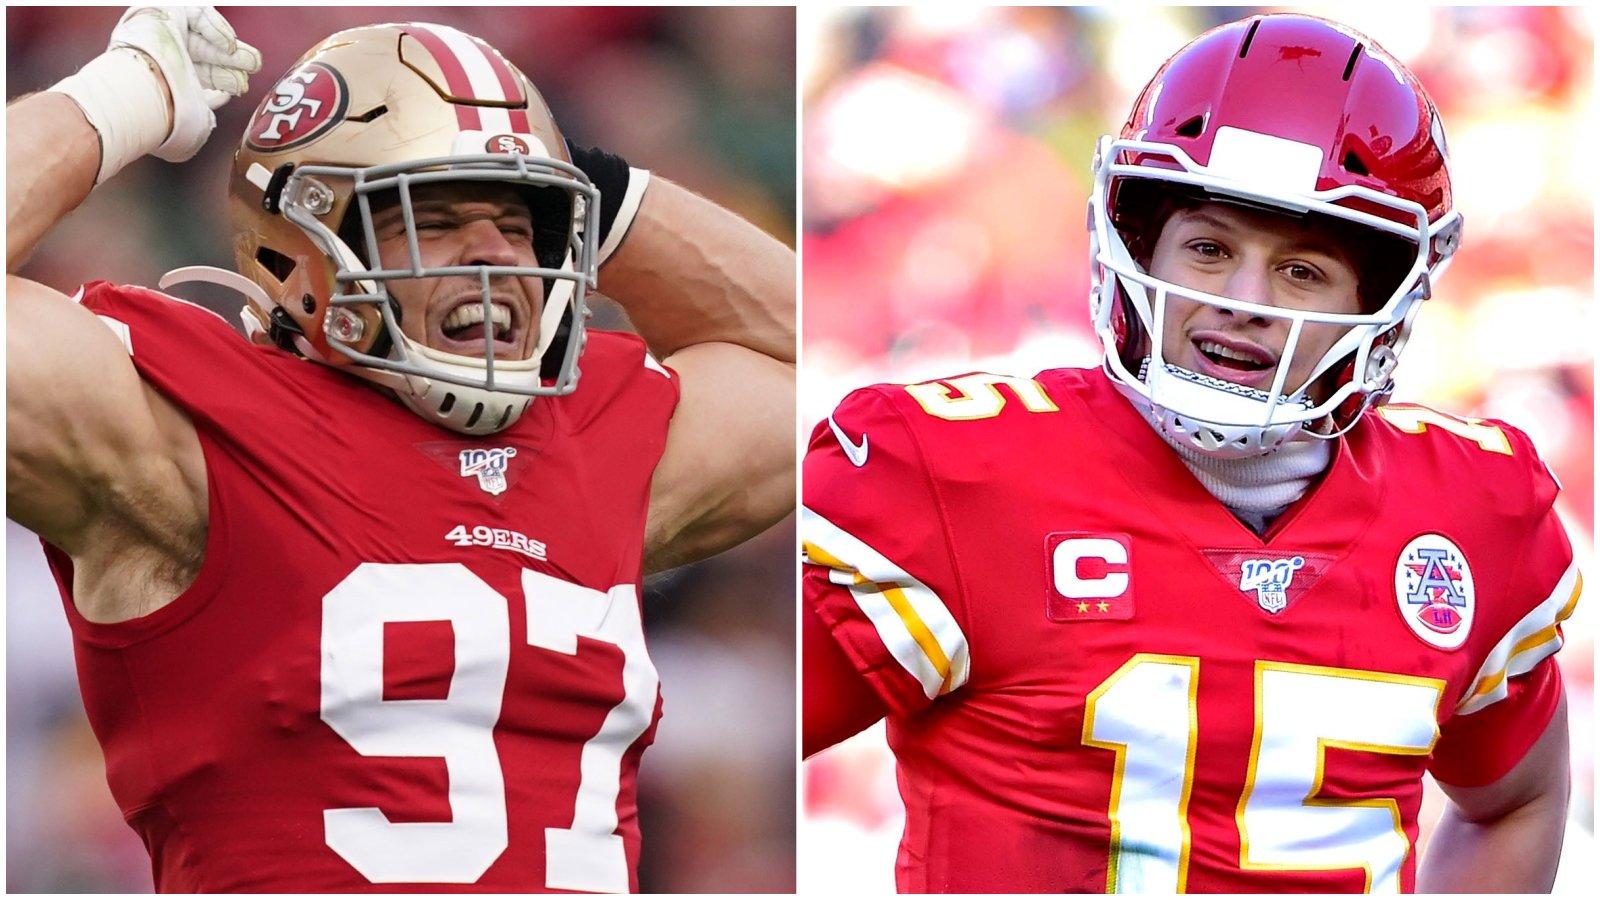 Chiefs Open As Slight Super Bowl 2020 Favorite over 49ers 1600x900